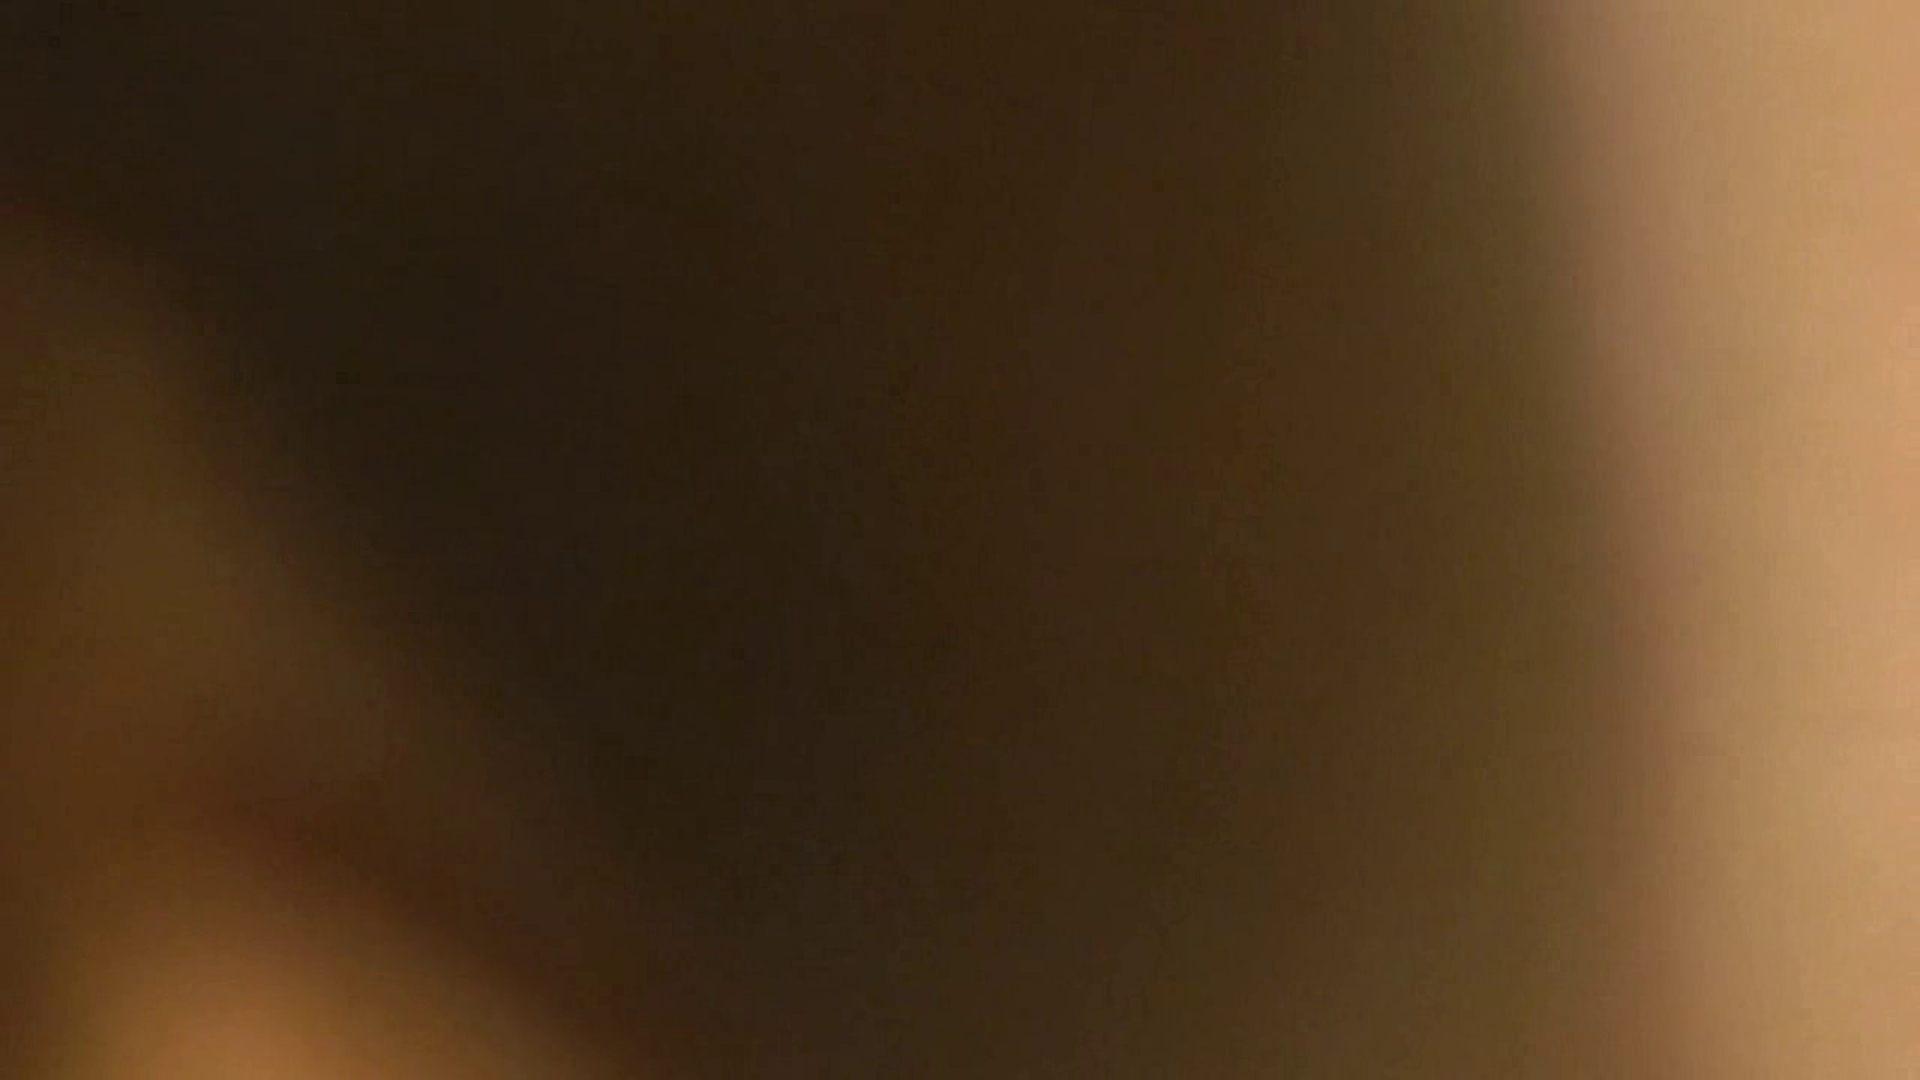 vol.1 Mayumi 窓越しに入浴シーン撮影に成功 入浴中の女性  57PIX 28